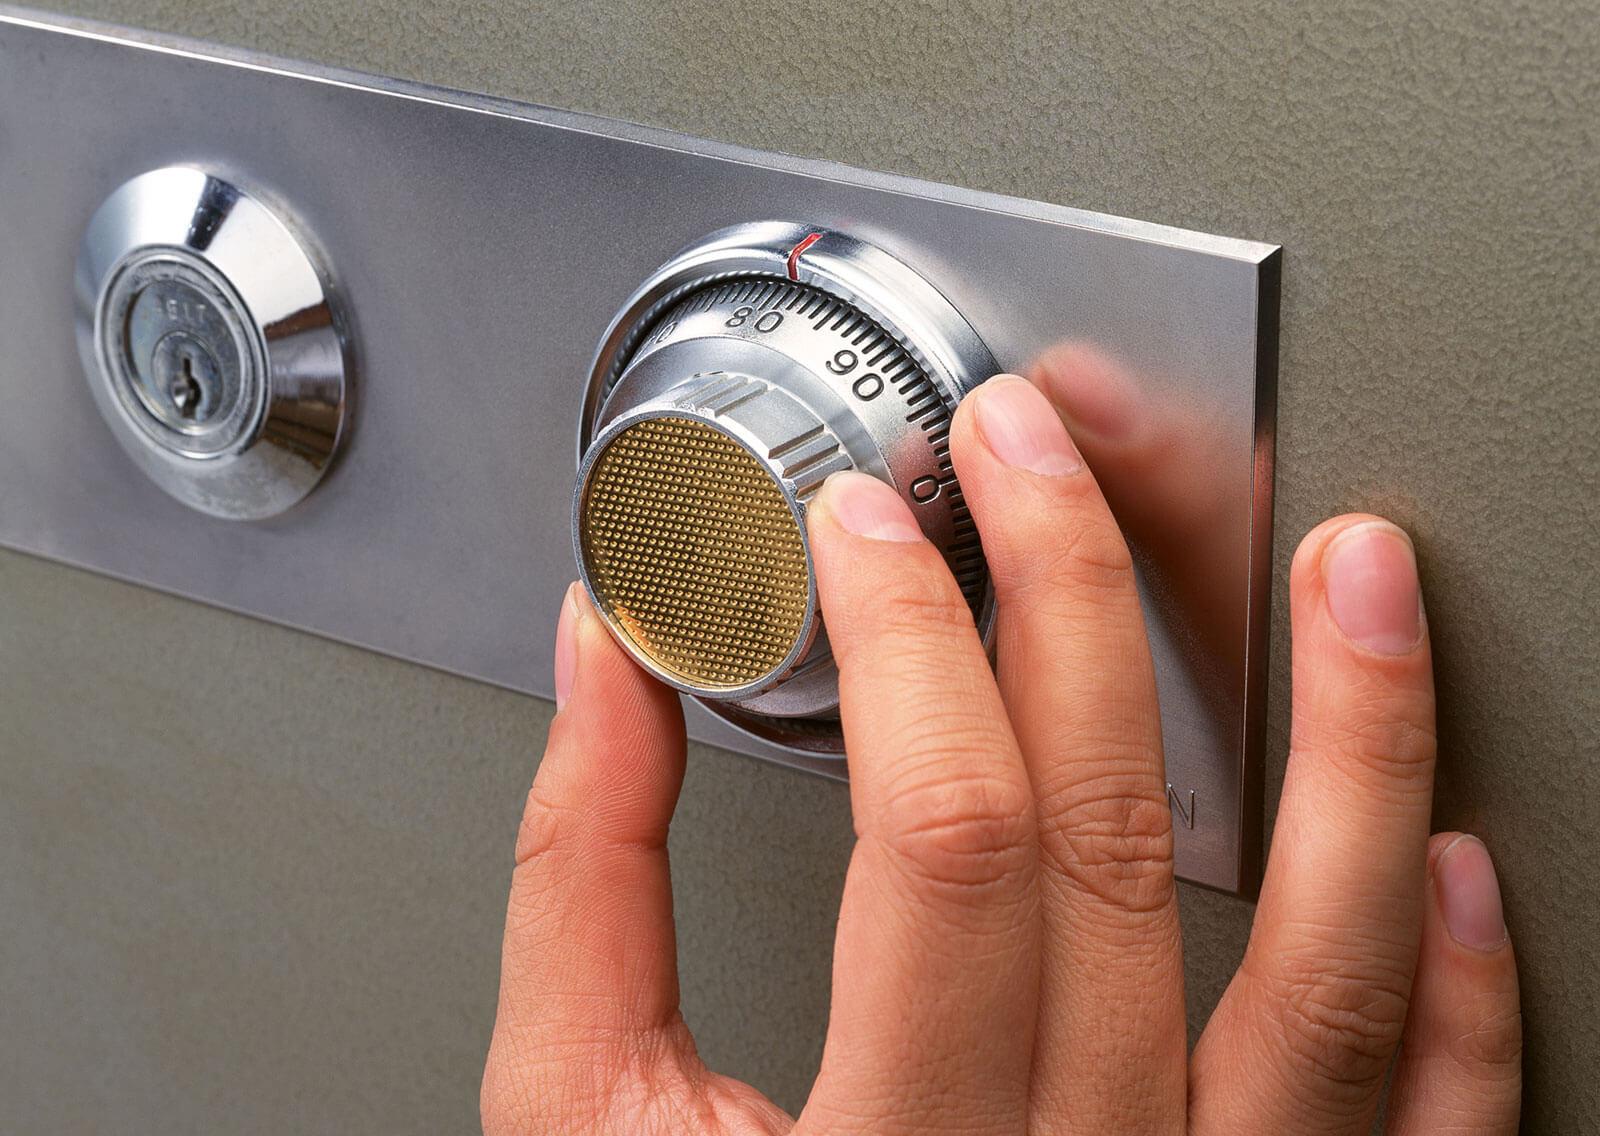 security lock system